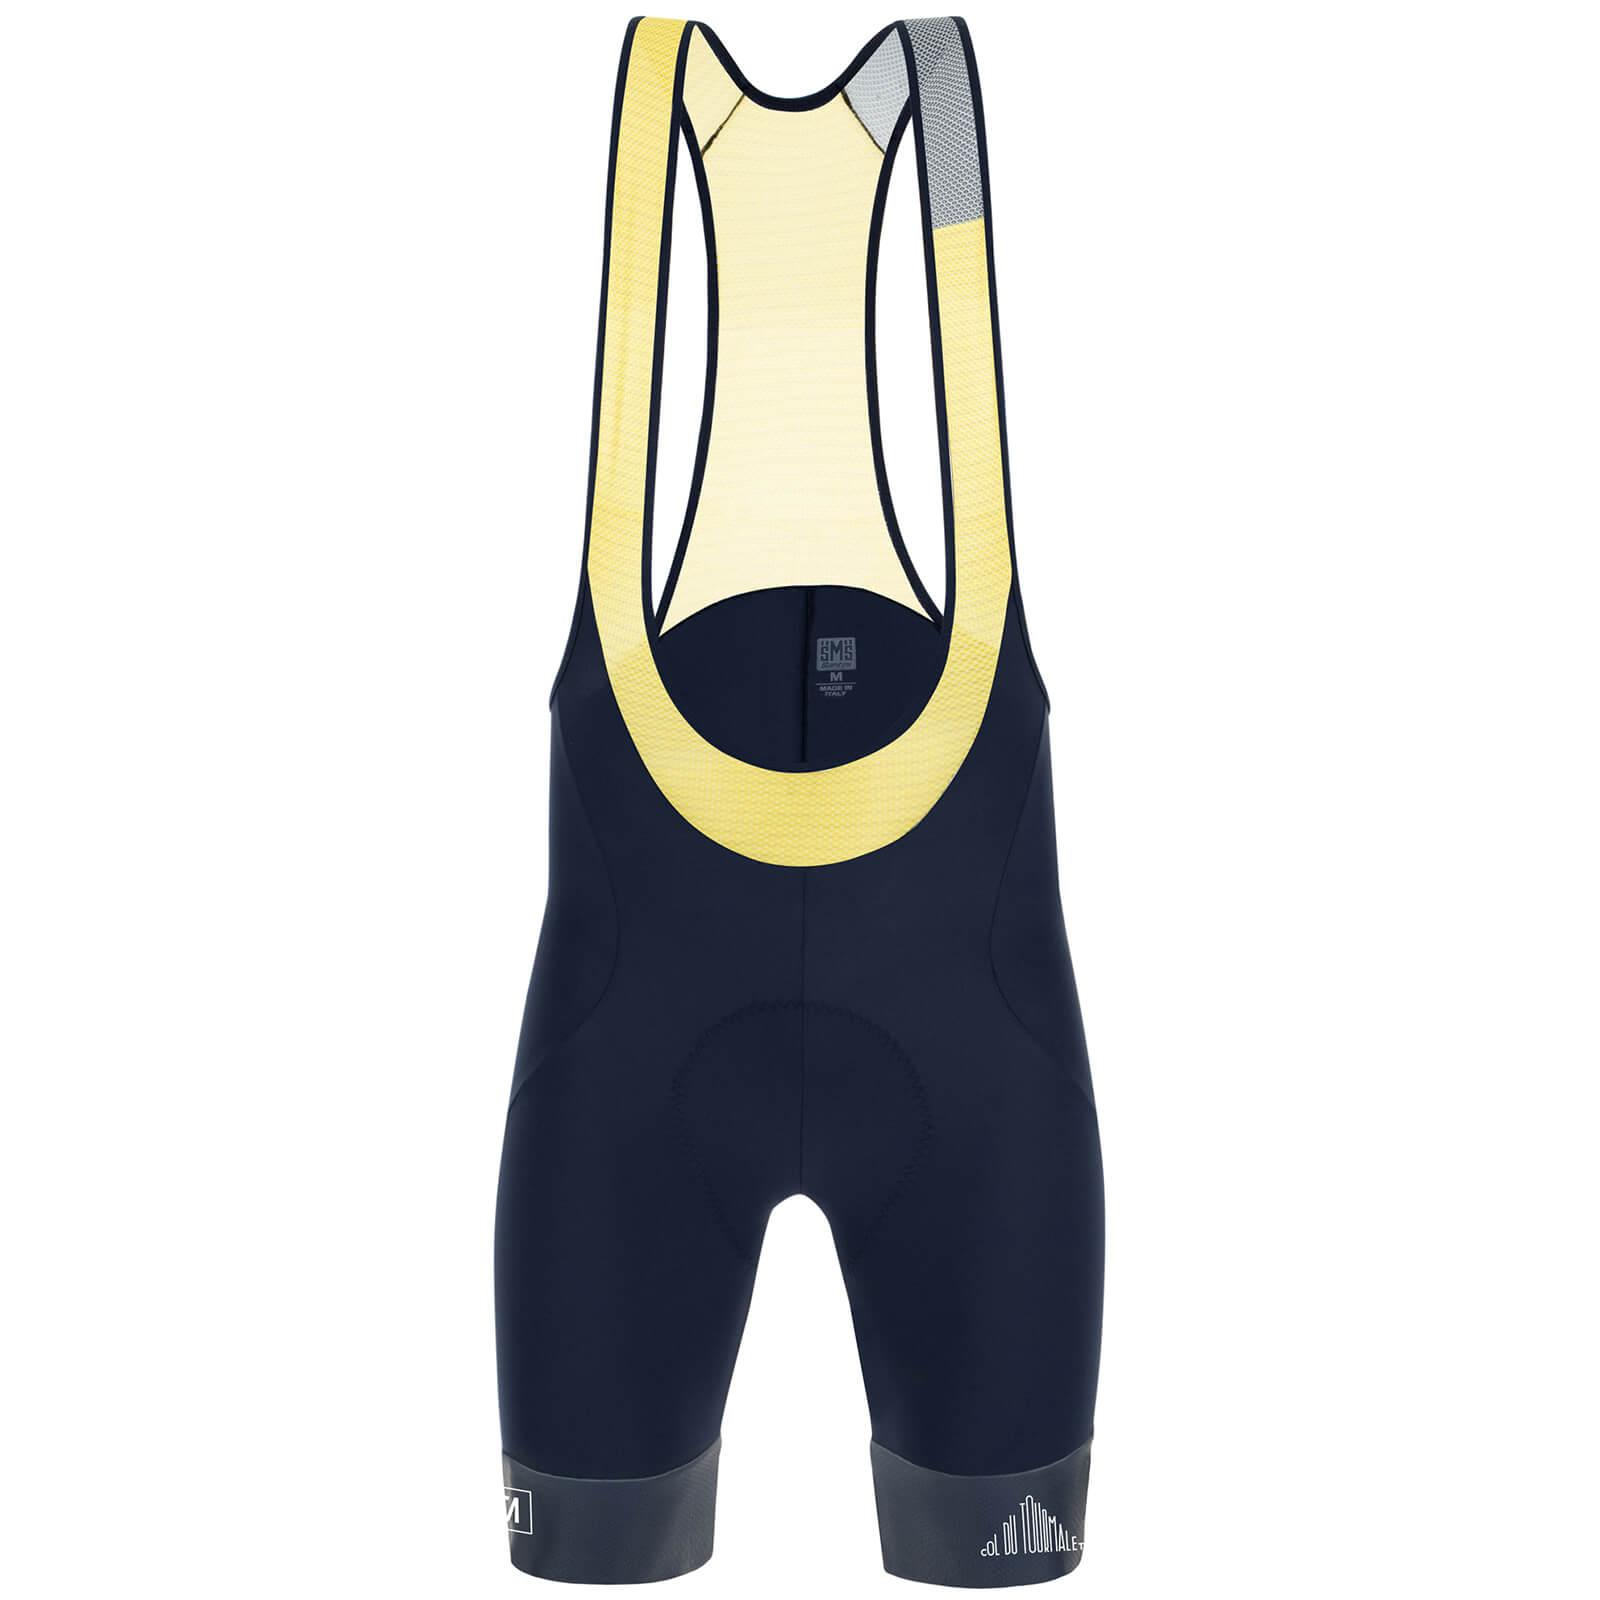 Santini La Vuelta 2020 Col Du Tourmalet Bib Shorts - L